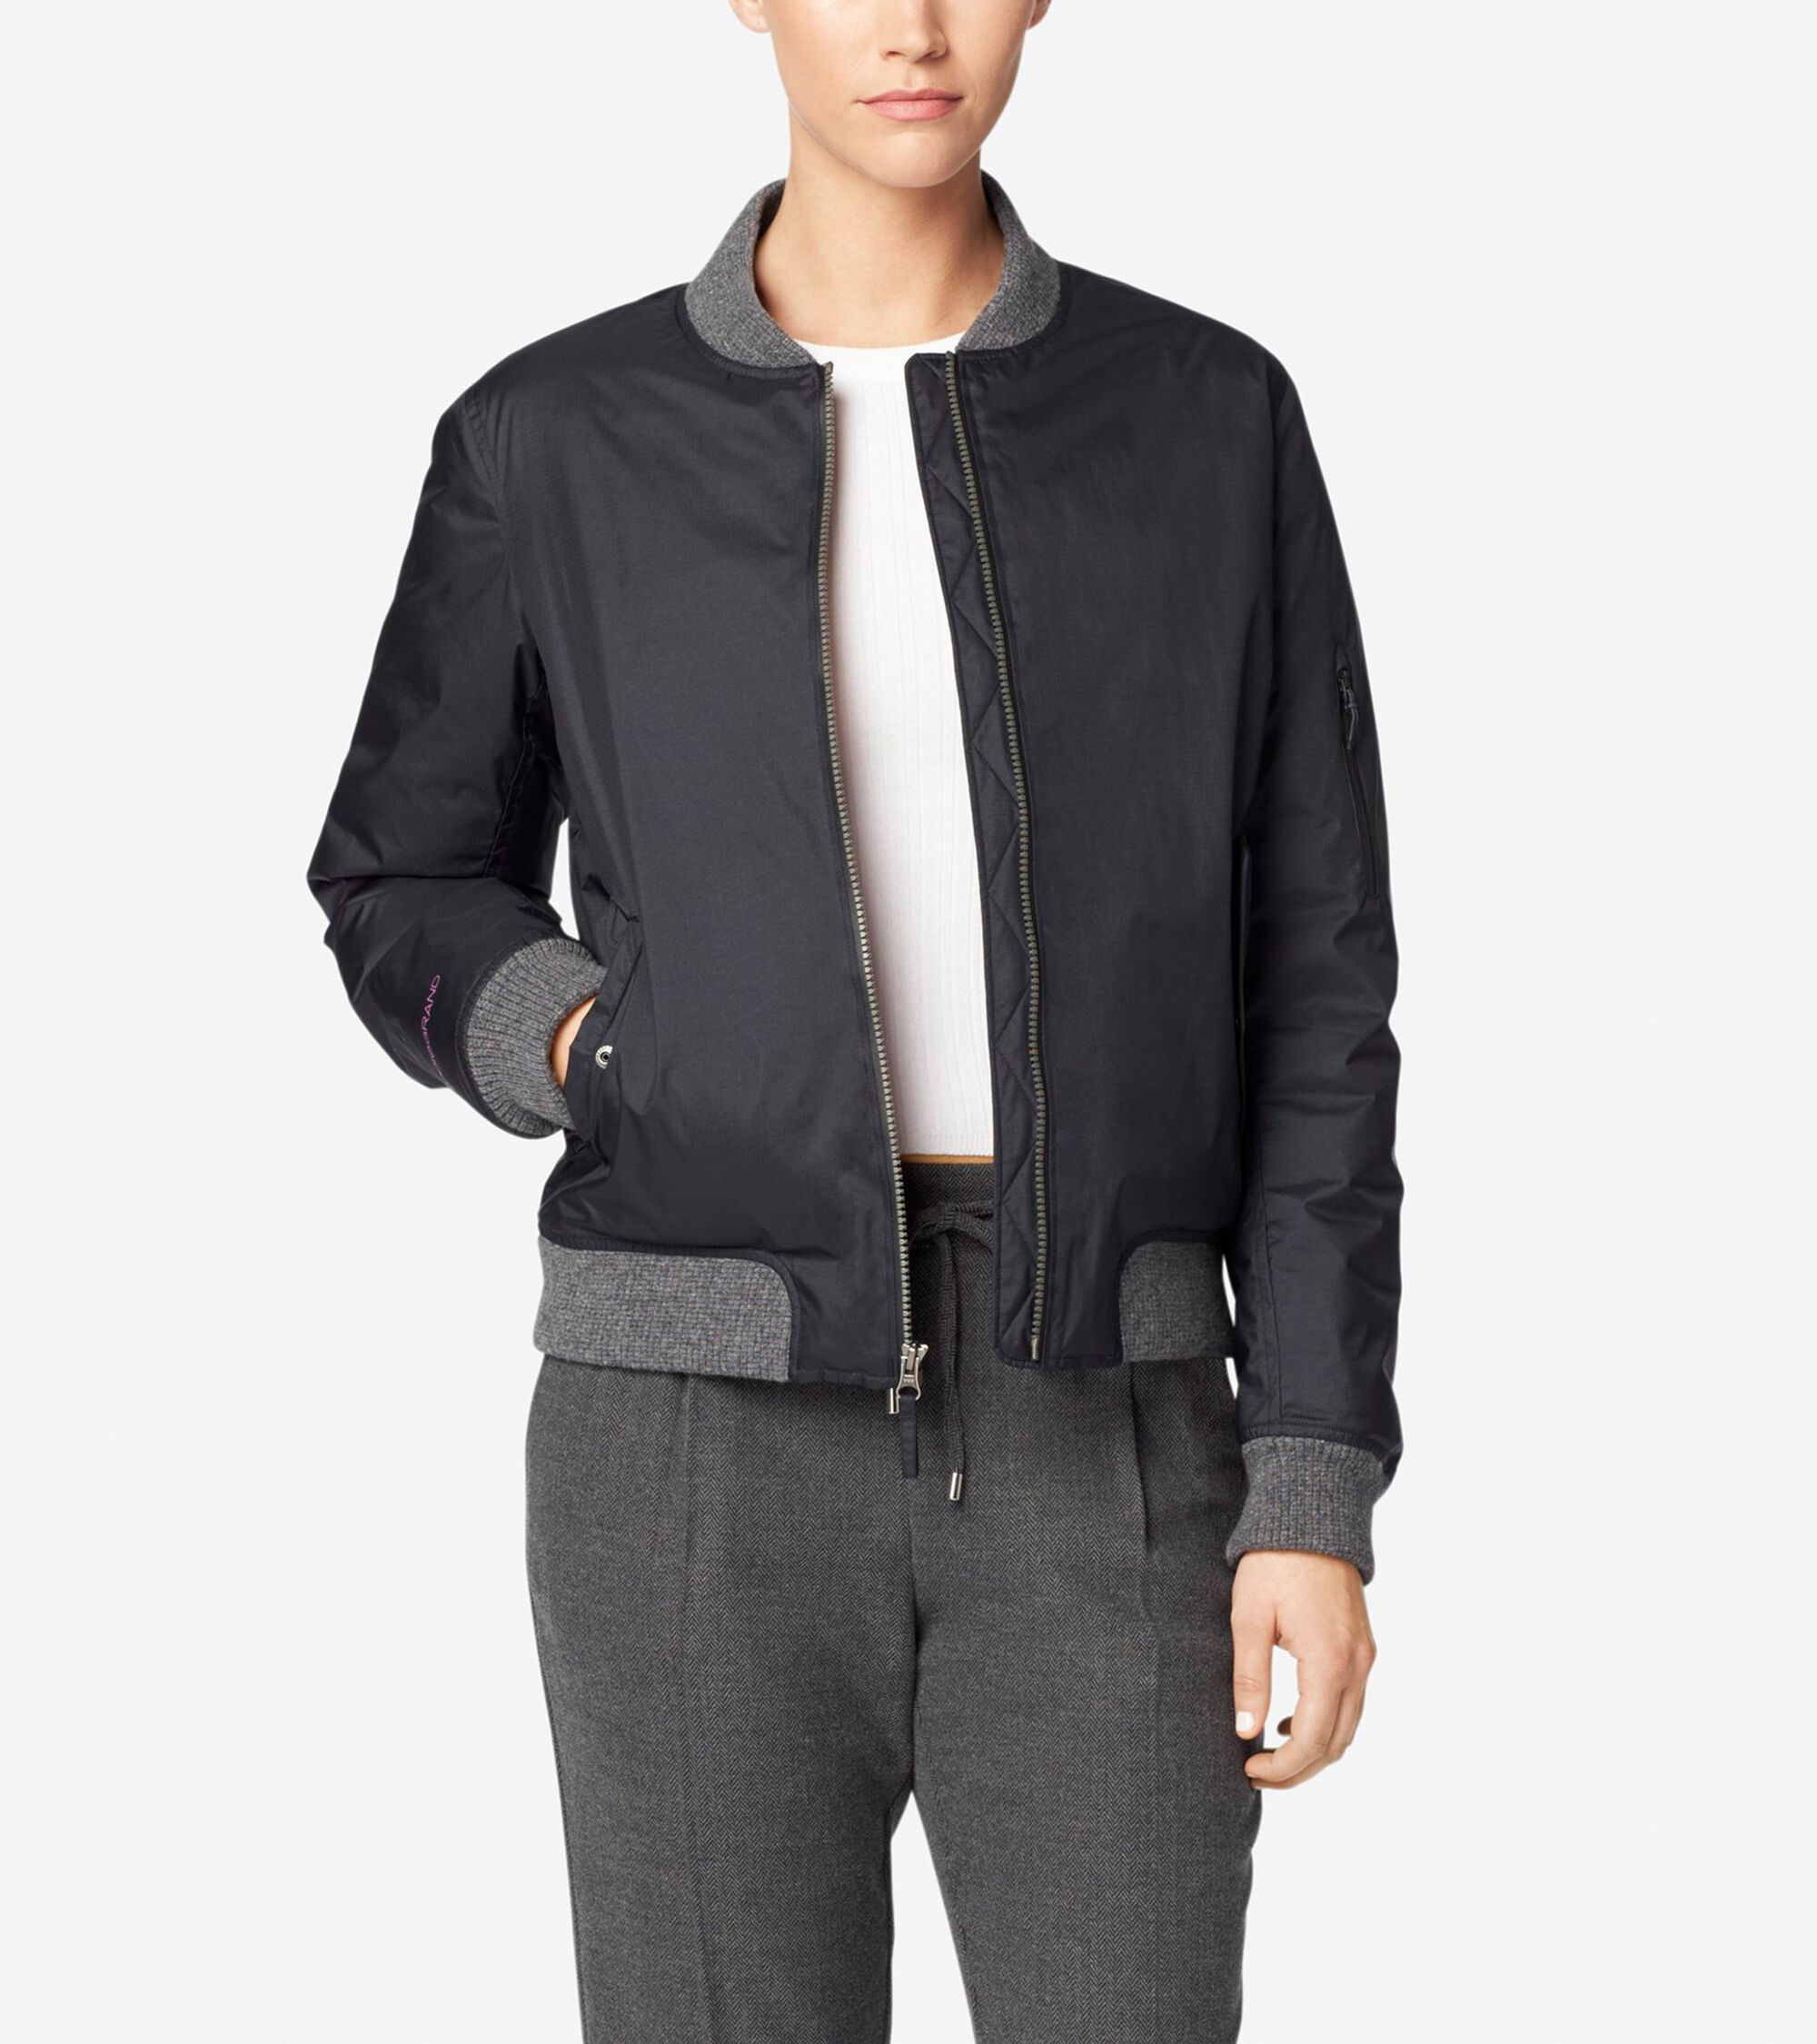 Leather jacket repair ottawa - Studi Grand Bomber Jacket Studi Grand